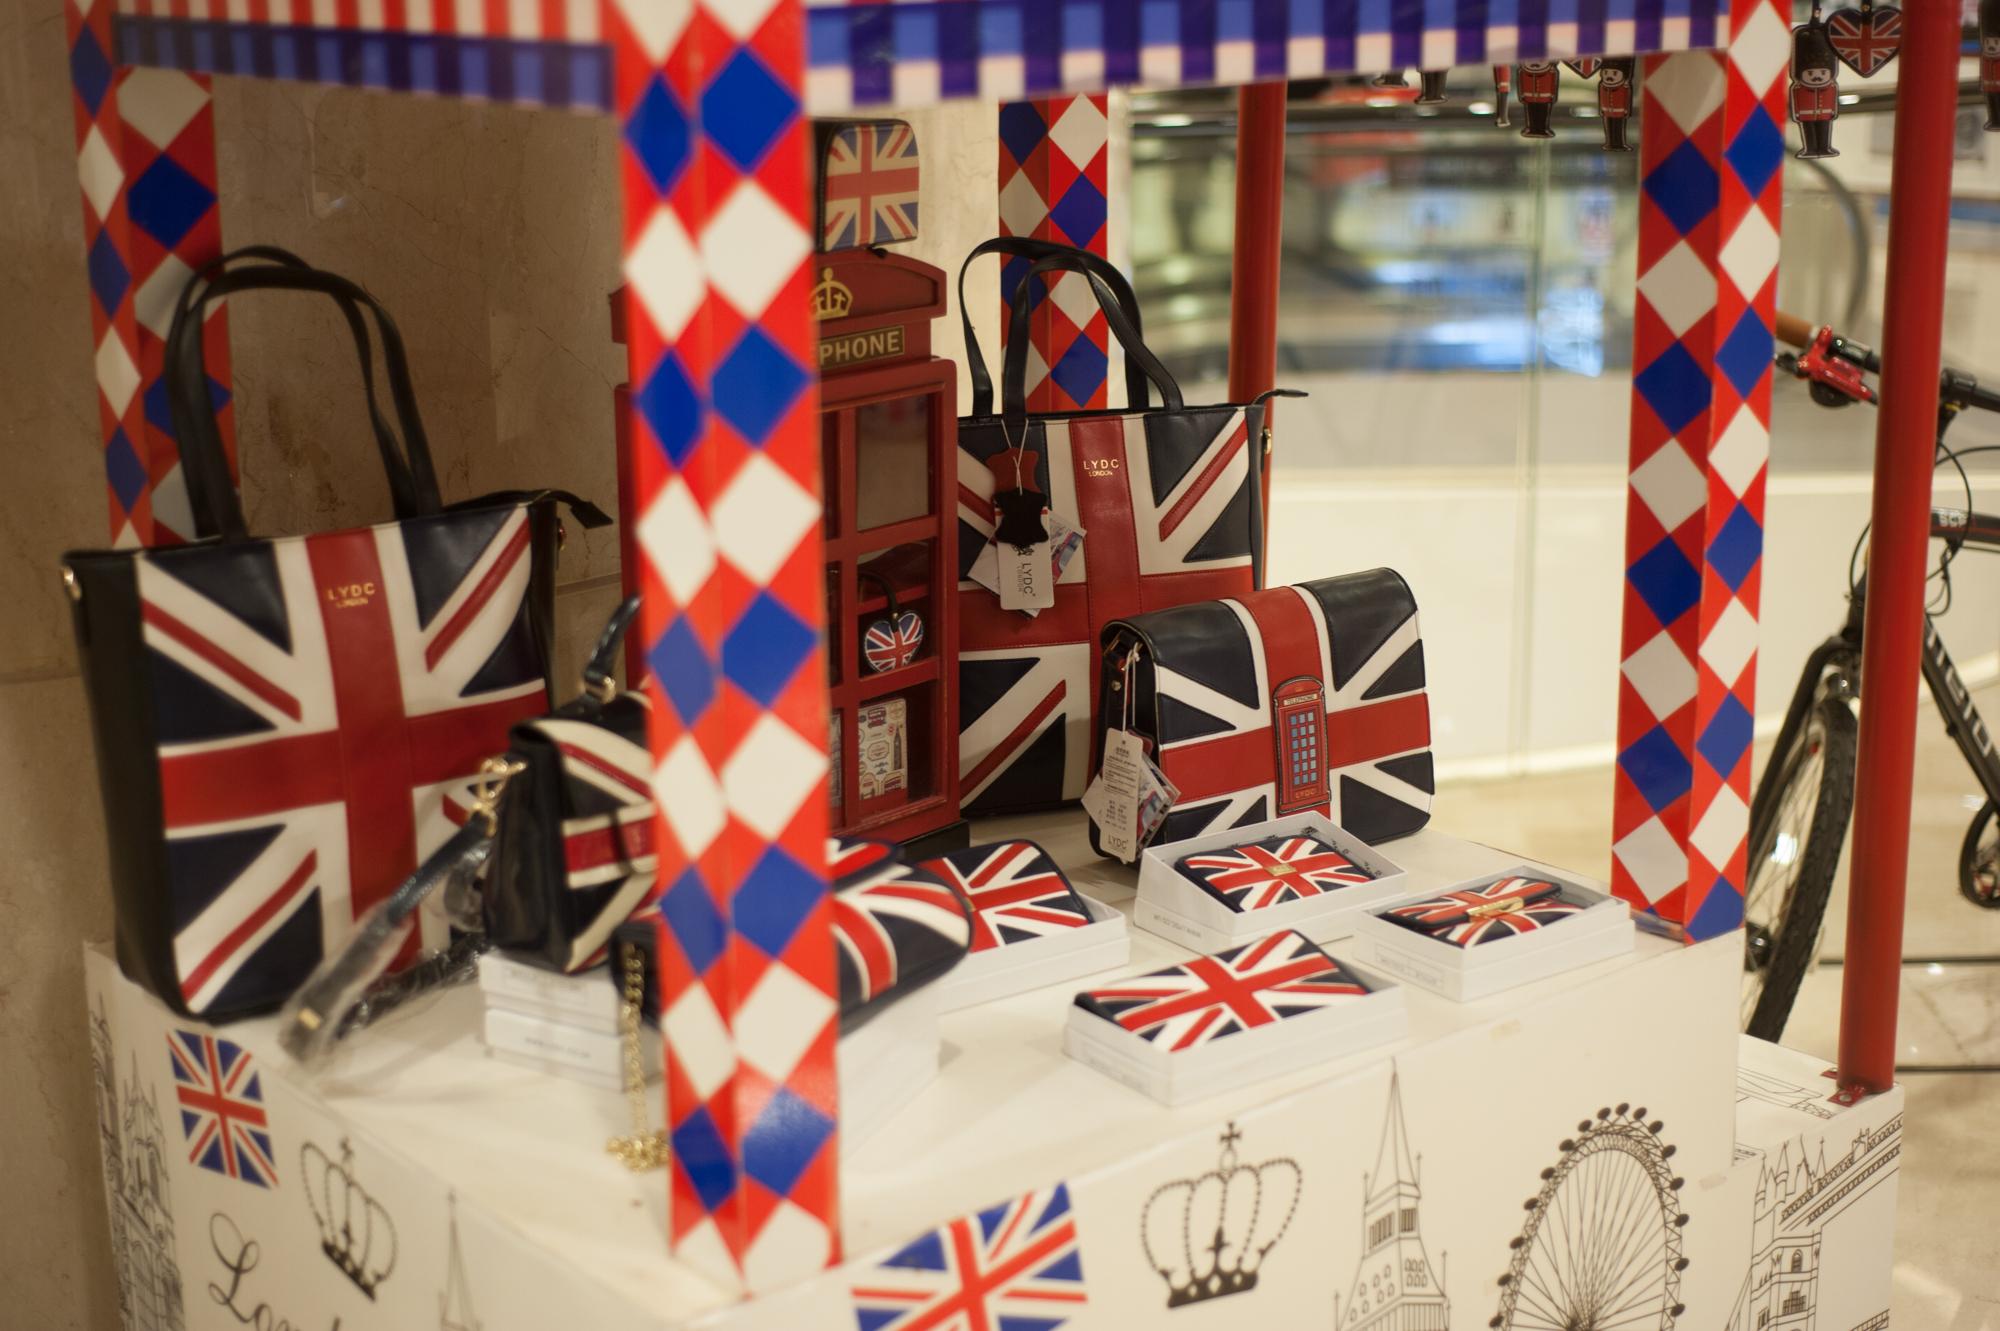 Third Annual Great British Brands Festival in Beijing June 12-21